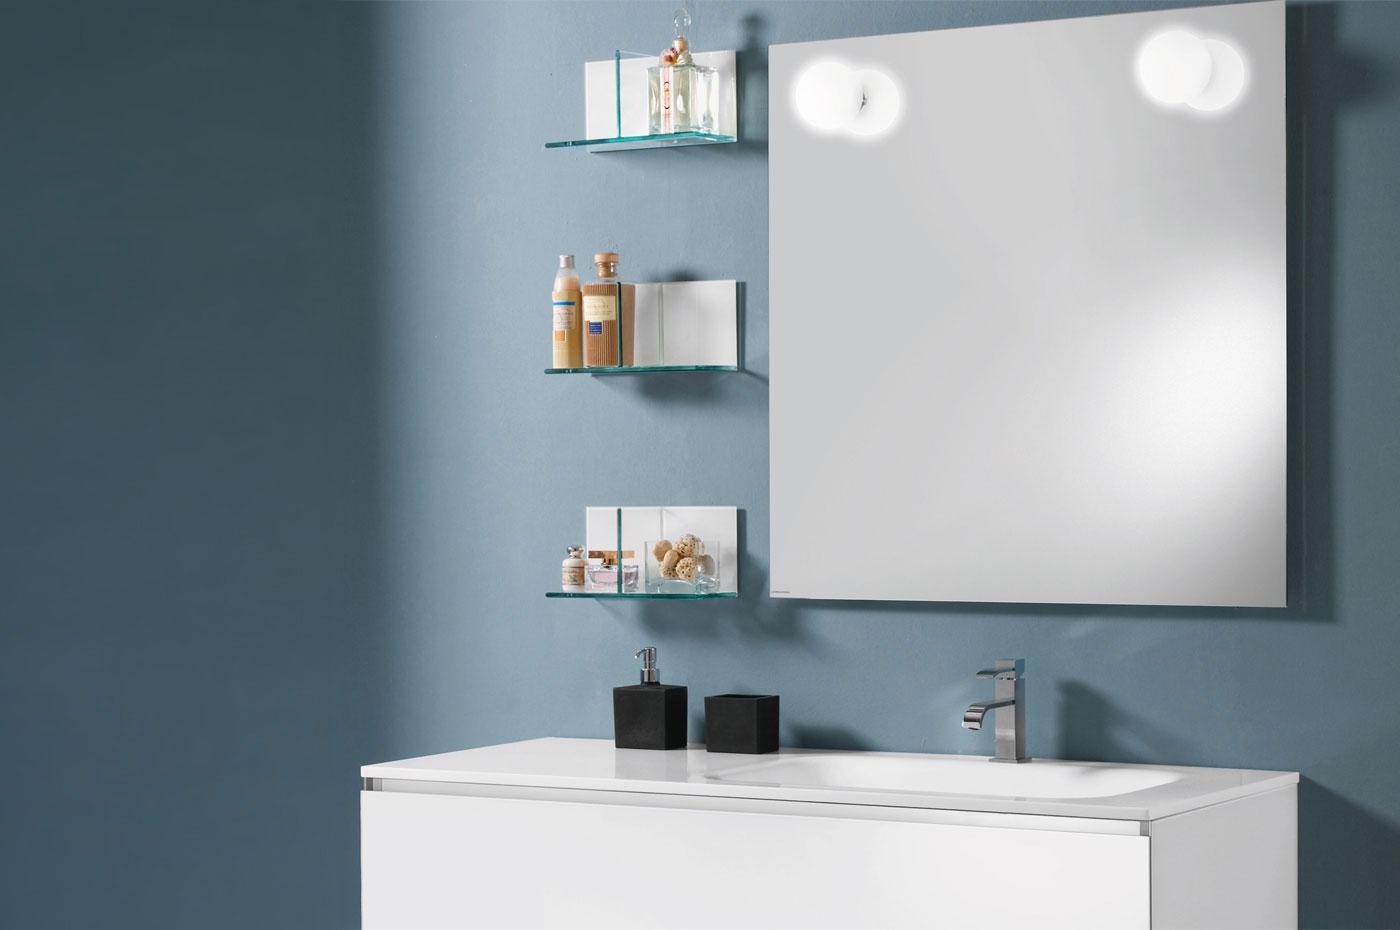 Domino Bathroom By Artelinea Wood